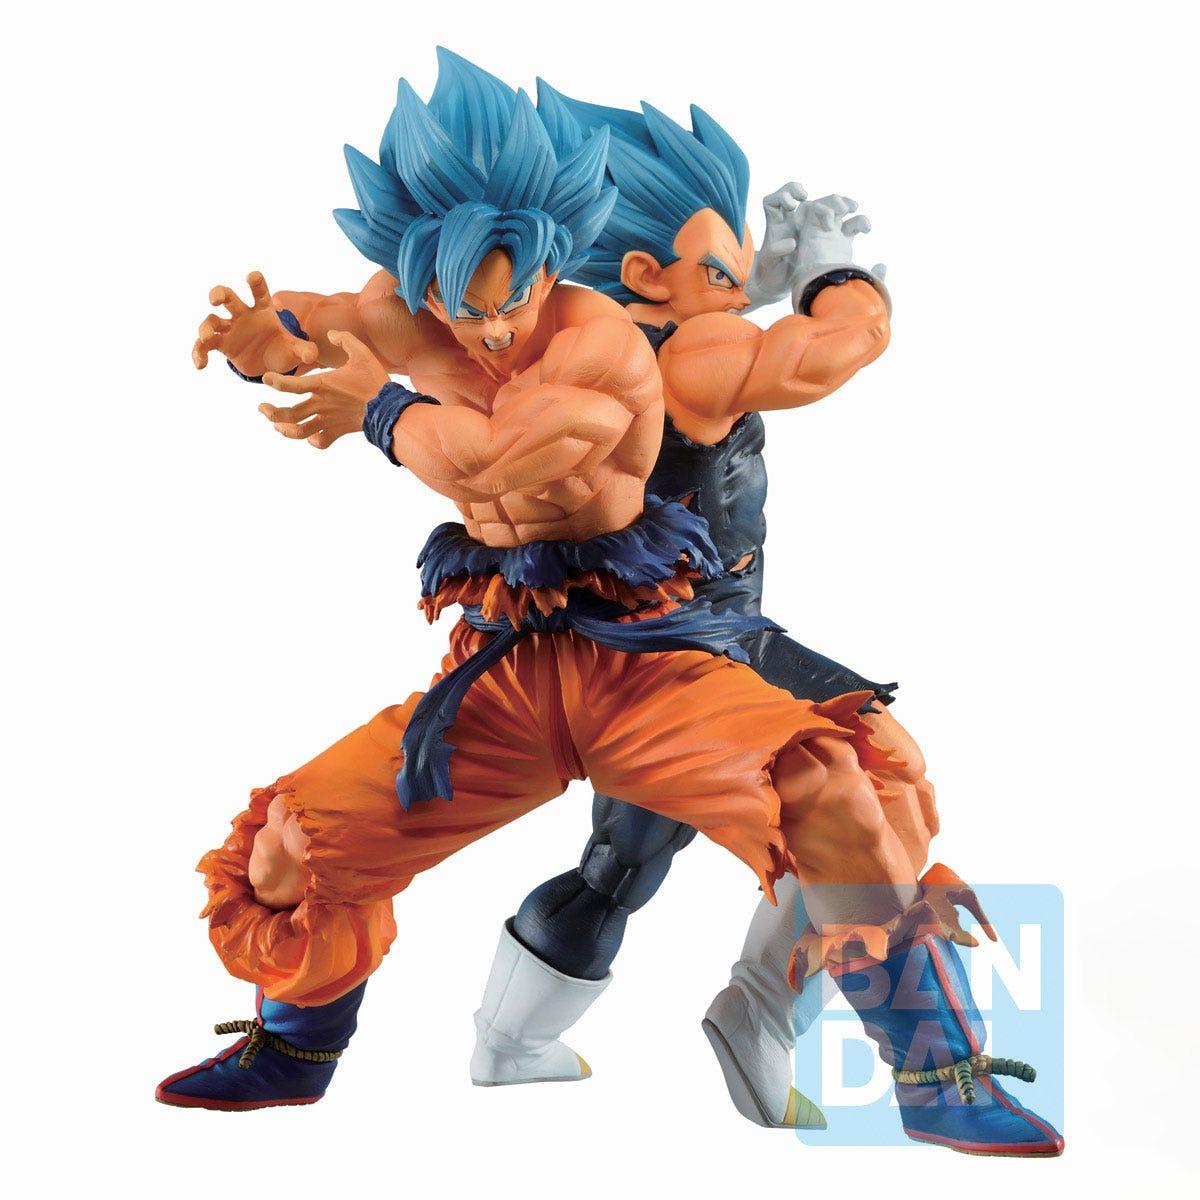 "Bandai Ichibansho Figure Son Goku(Super Saiyan God Super Saiyan)& Vegeta (Super Saiyan God Super Saiyan) (Vs Omnibus Super) ""Dragon Ball Super"""